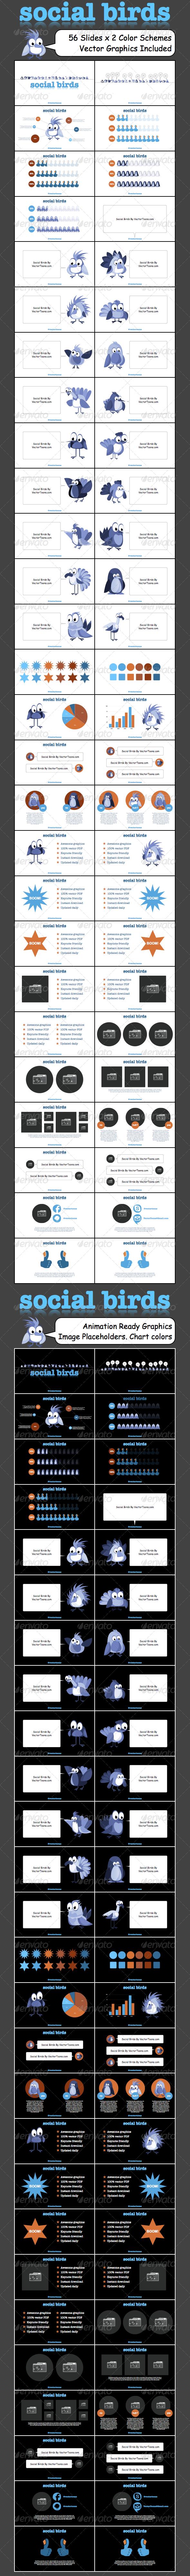 GraphicRiver Social Birds Vector Infographic 4995146